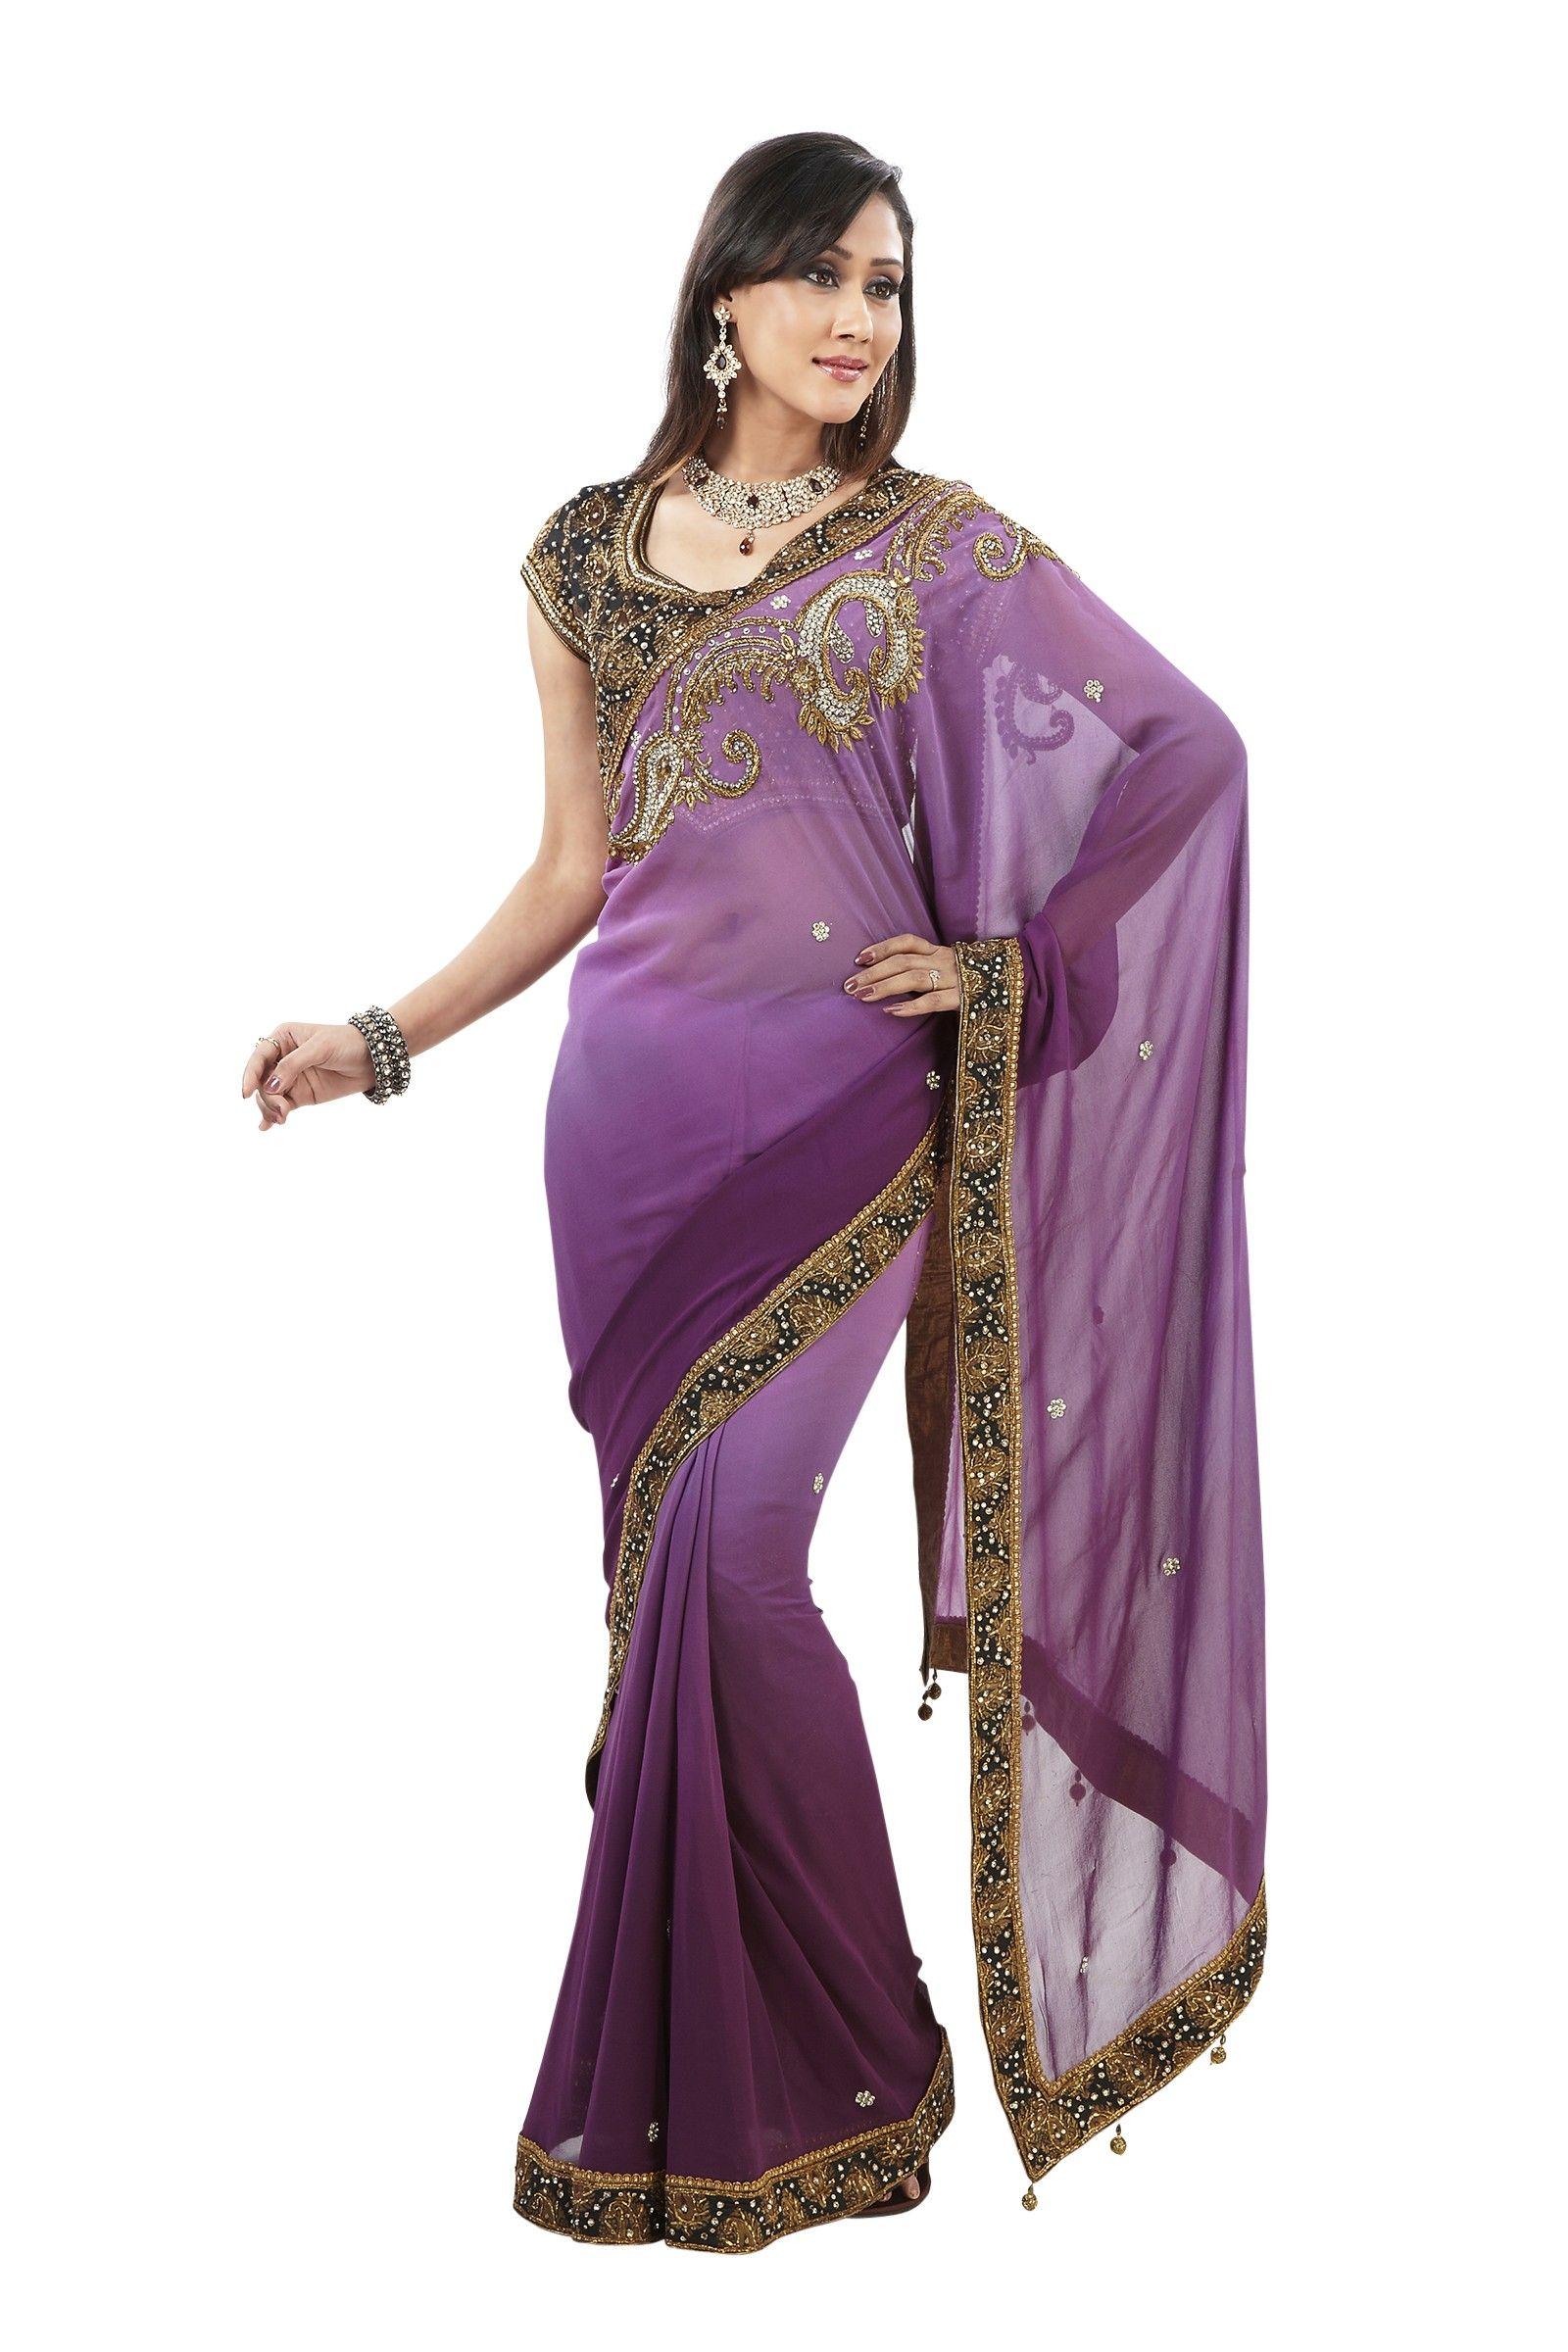 Yeola paithani saree images lilac orchard saree  indian culturefashion  pinterest  saree